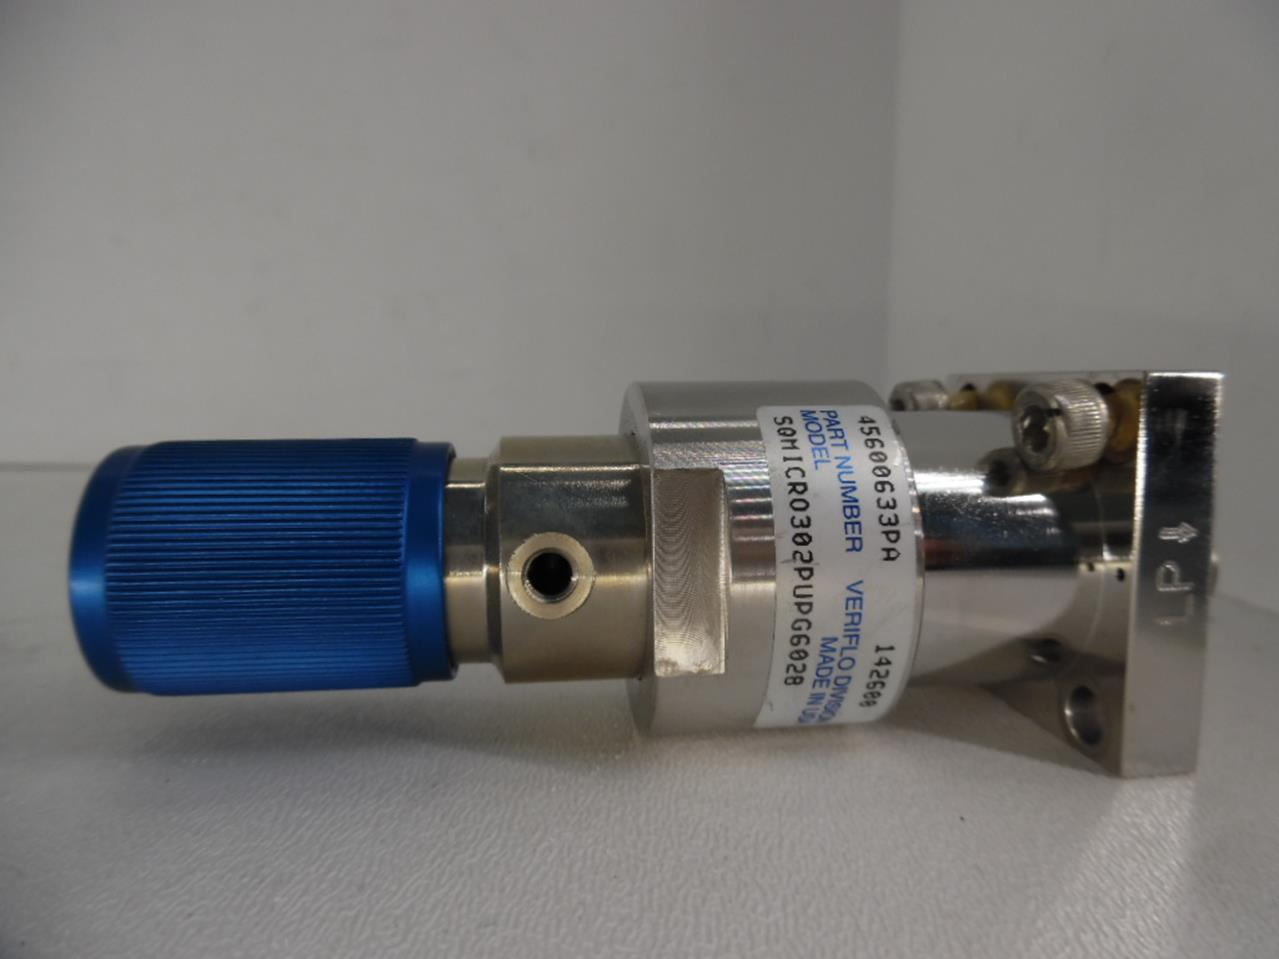 10 PCS 1000pF 100V 5/% Silver Dip Mica Capacitors Dipped DM15 .001uF DM15FA102J